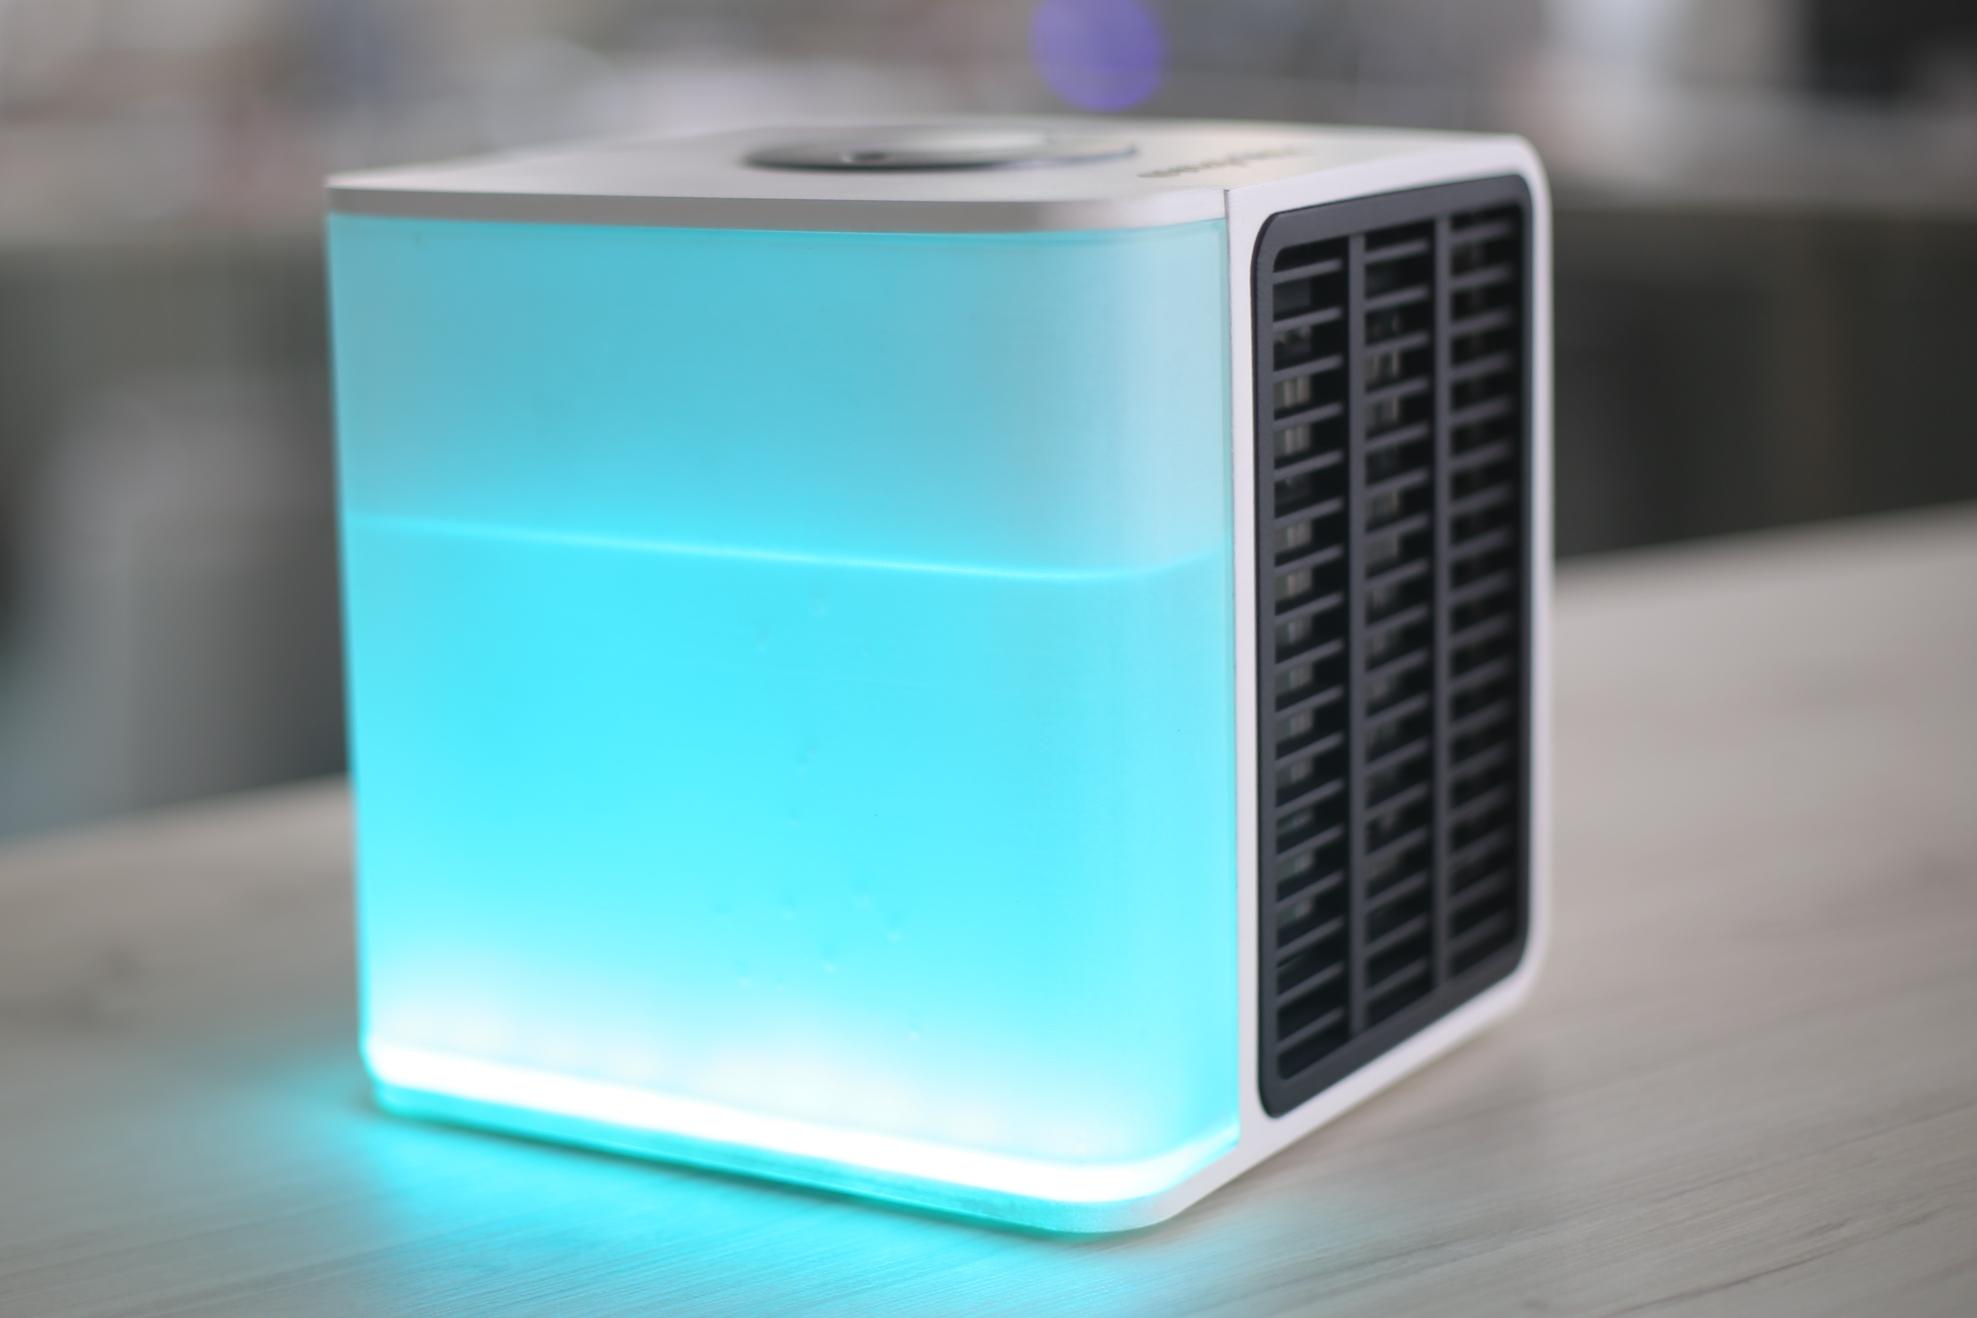 991b9045b Evapolar  incrível ar condicionado portátil funciona com água  vídeo  -  Ficha Técnica - TecMundo